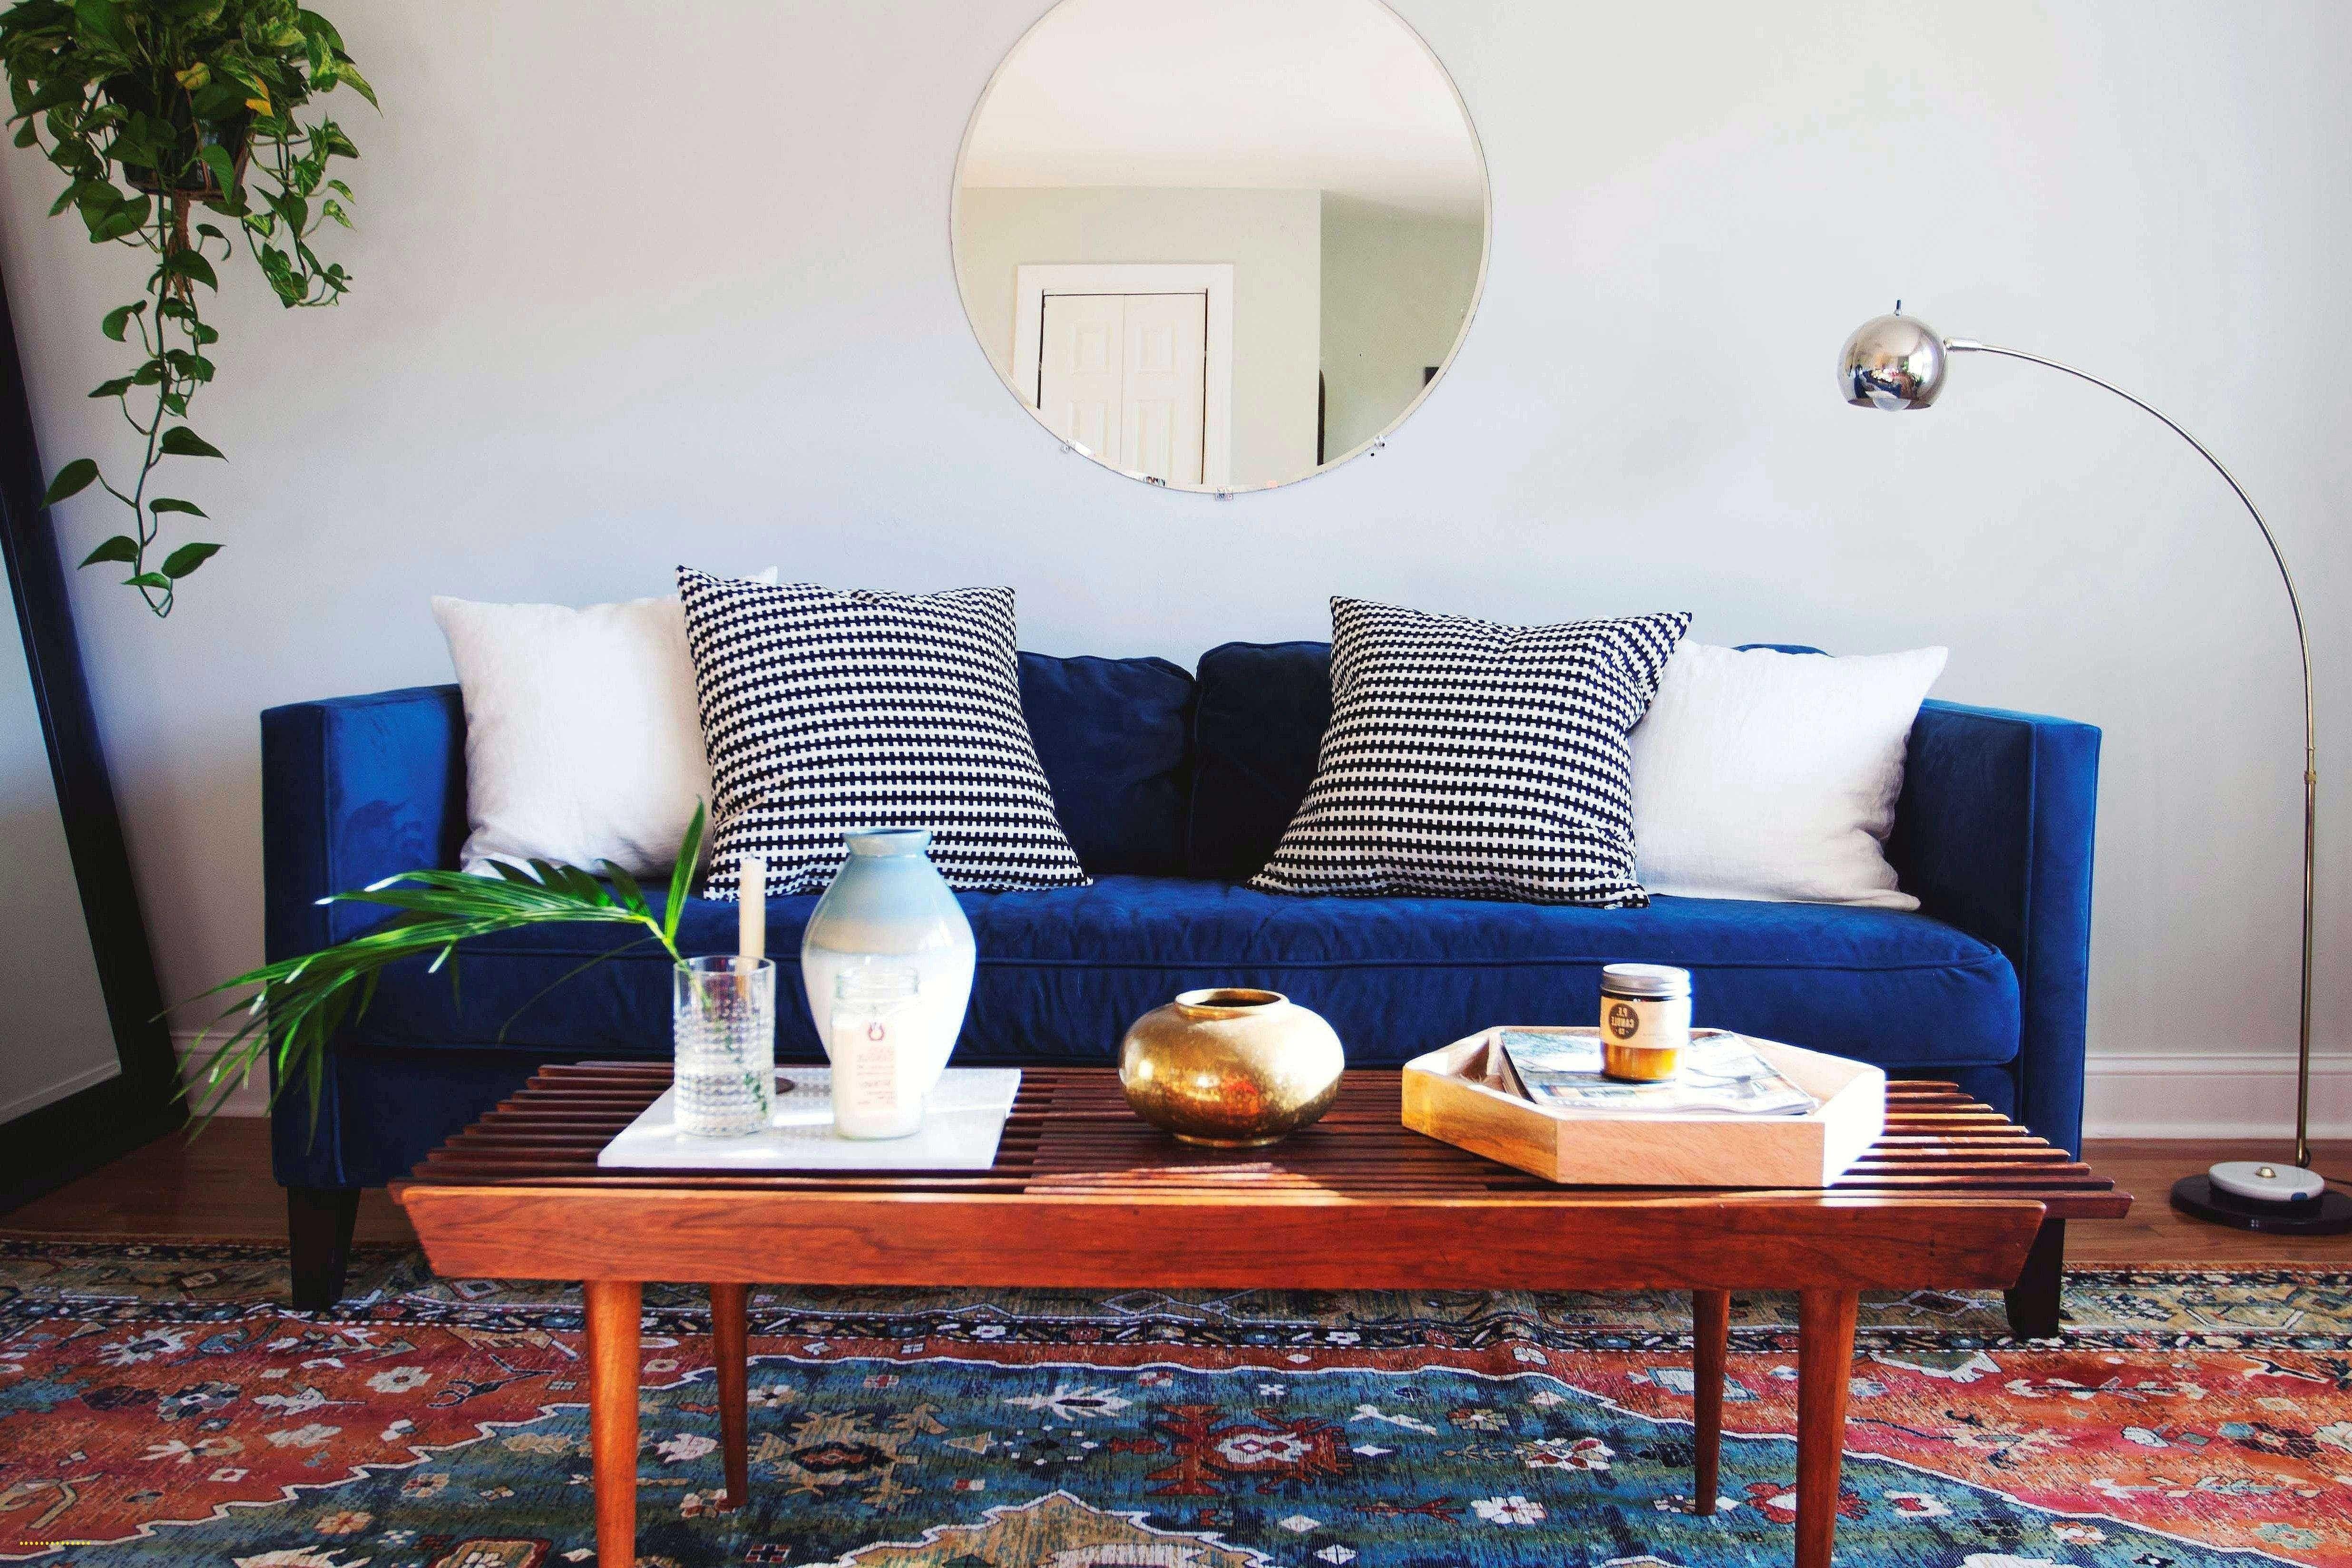 Black And Blue Living Room Inspirational 48 Inspirational Blue And Black Living Room D Ide Dekorasi Dinding Ruang Tamu Dekorasi Ruang Tamu Ruang Keluarga Mewah Blue living room decor